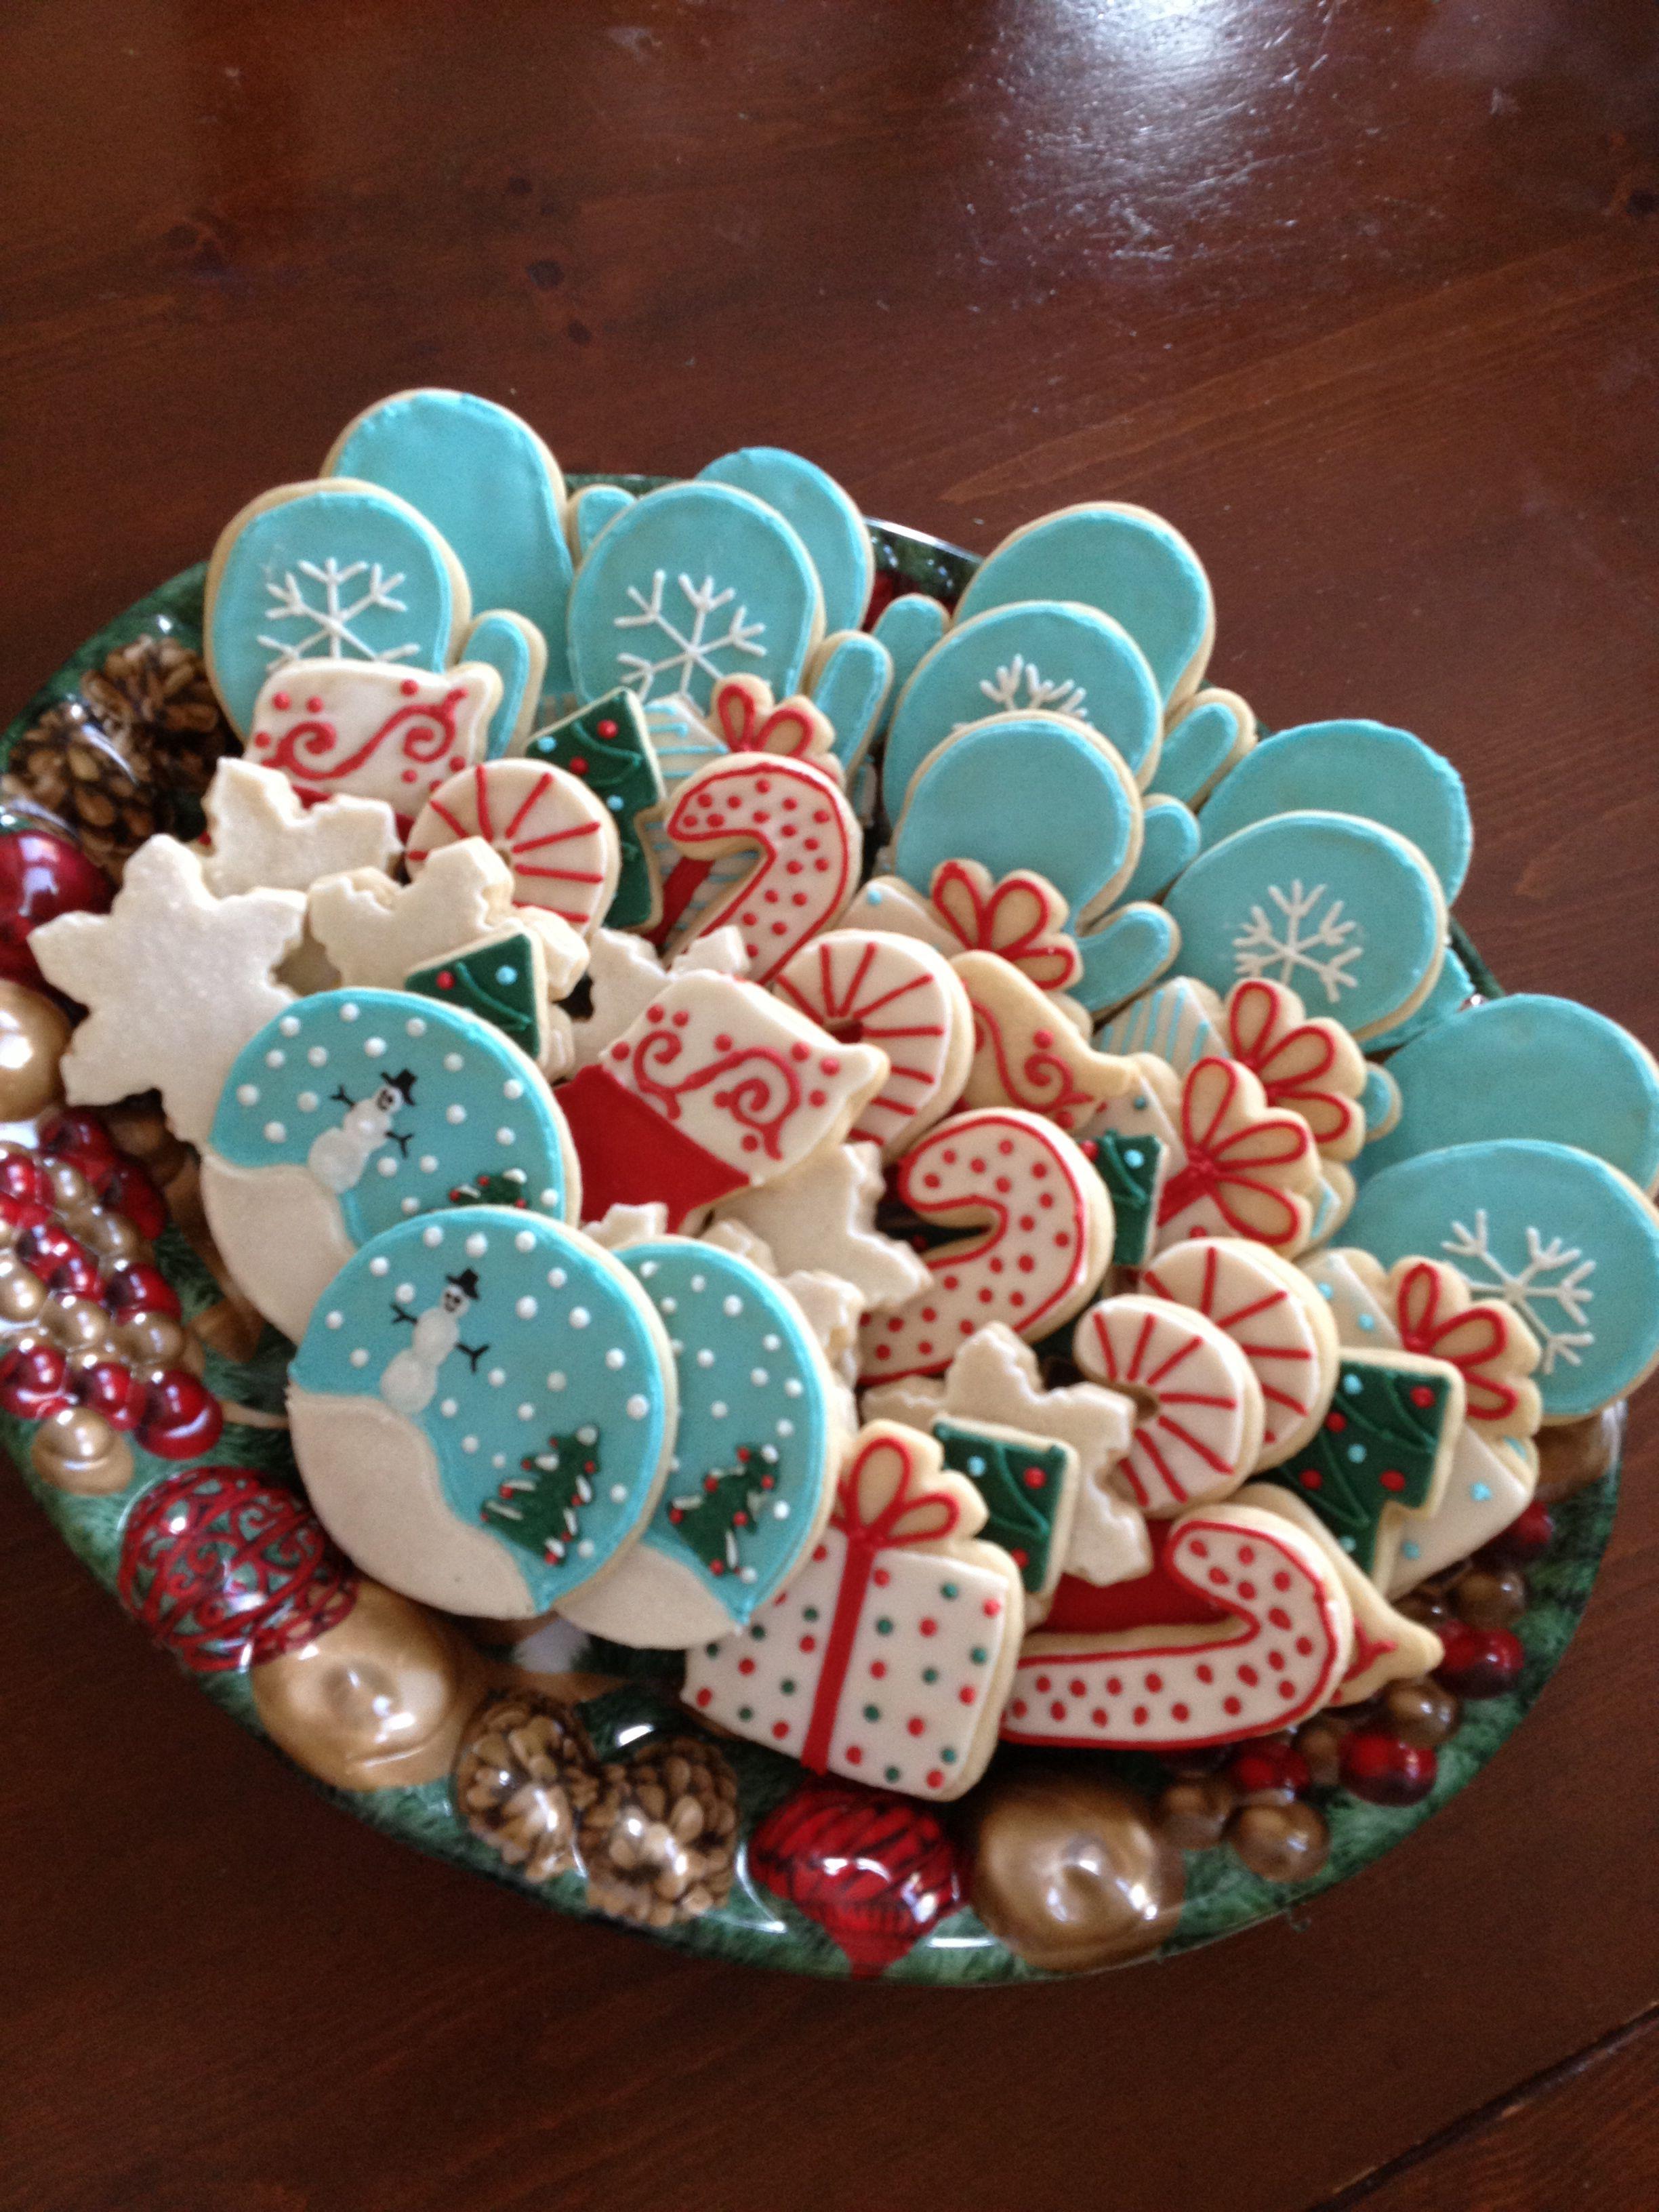 Niki's Beautiful Homemade Christmas Cookies from The